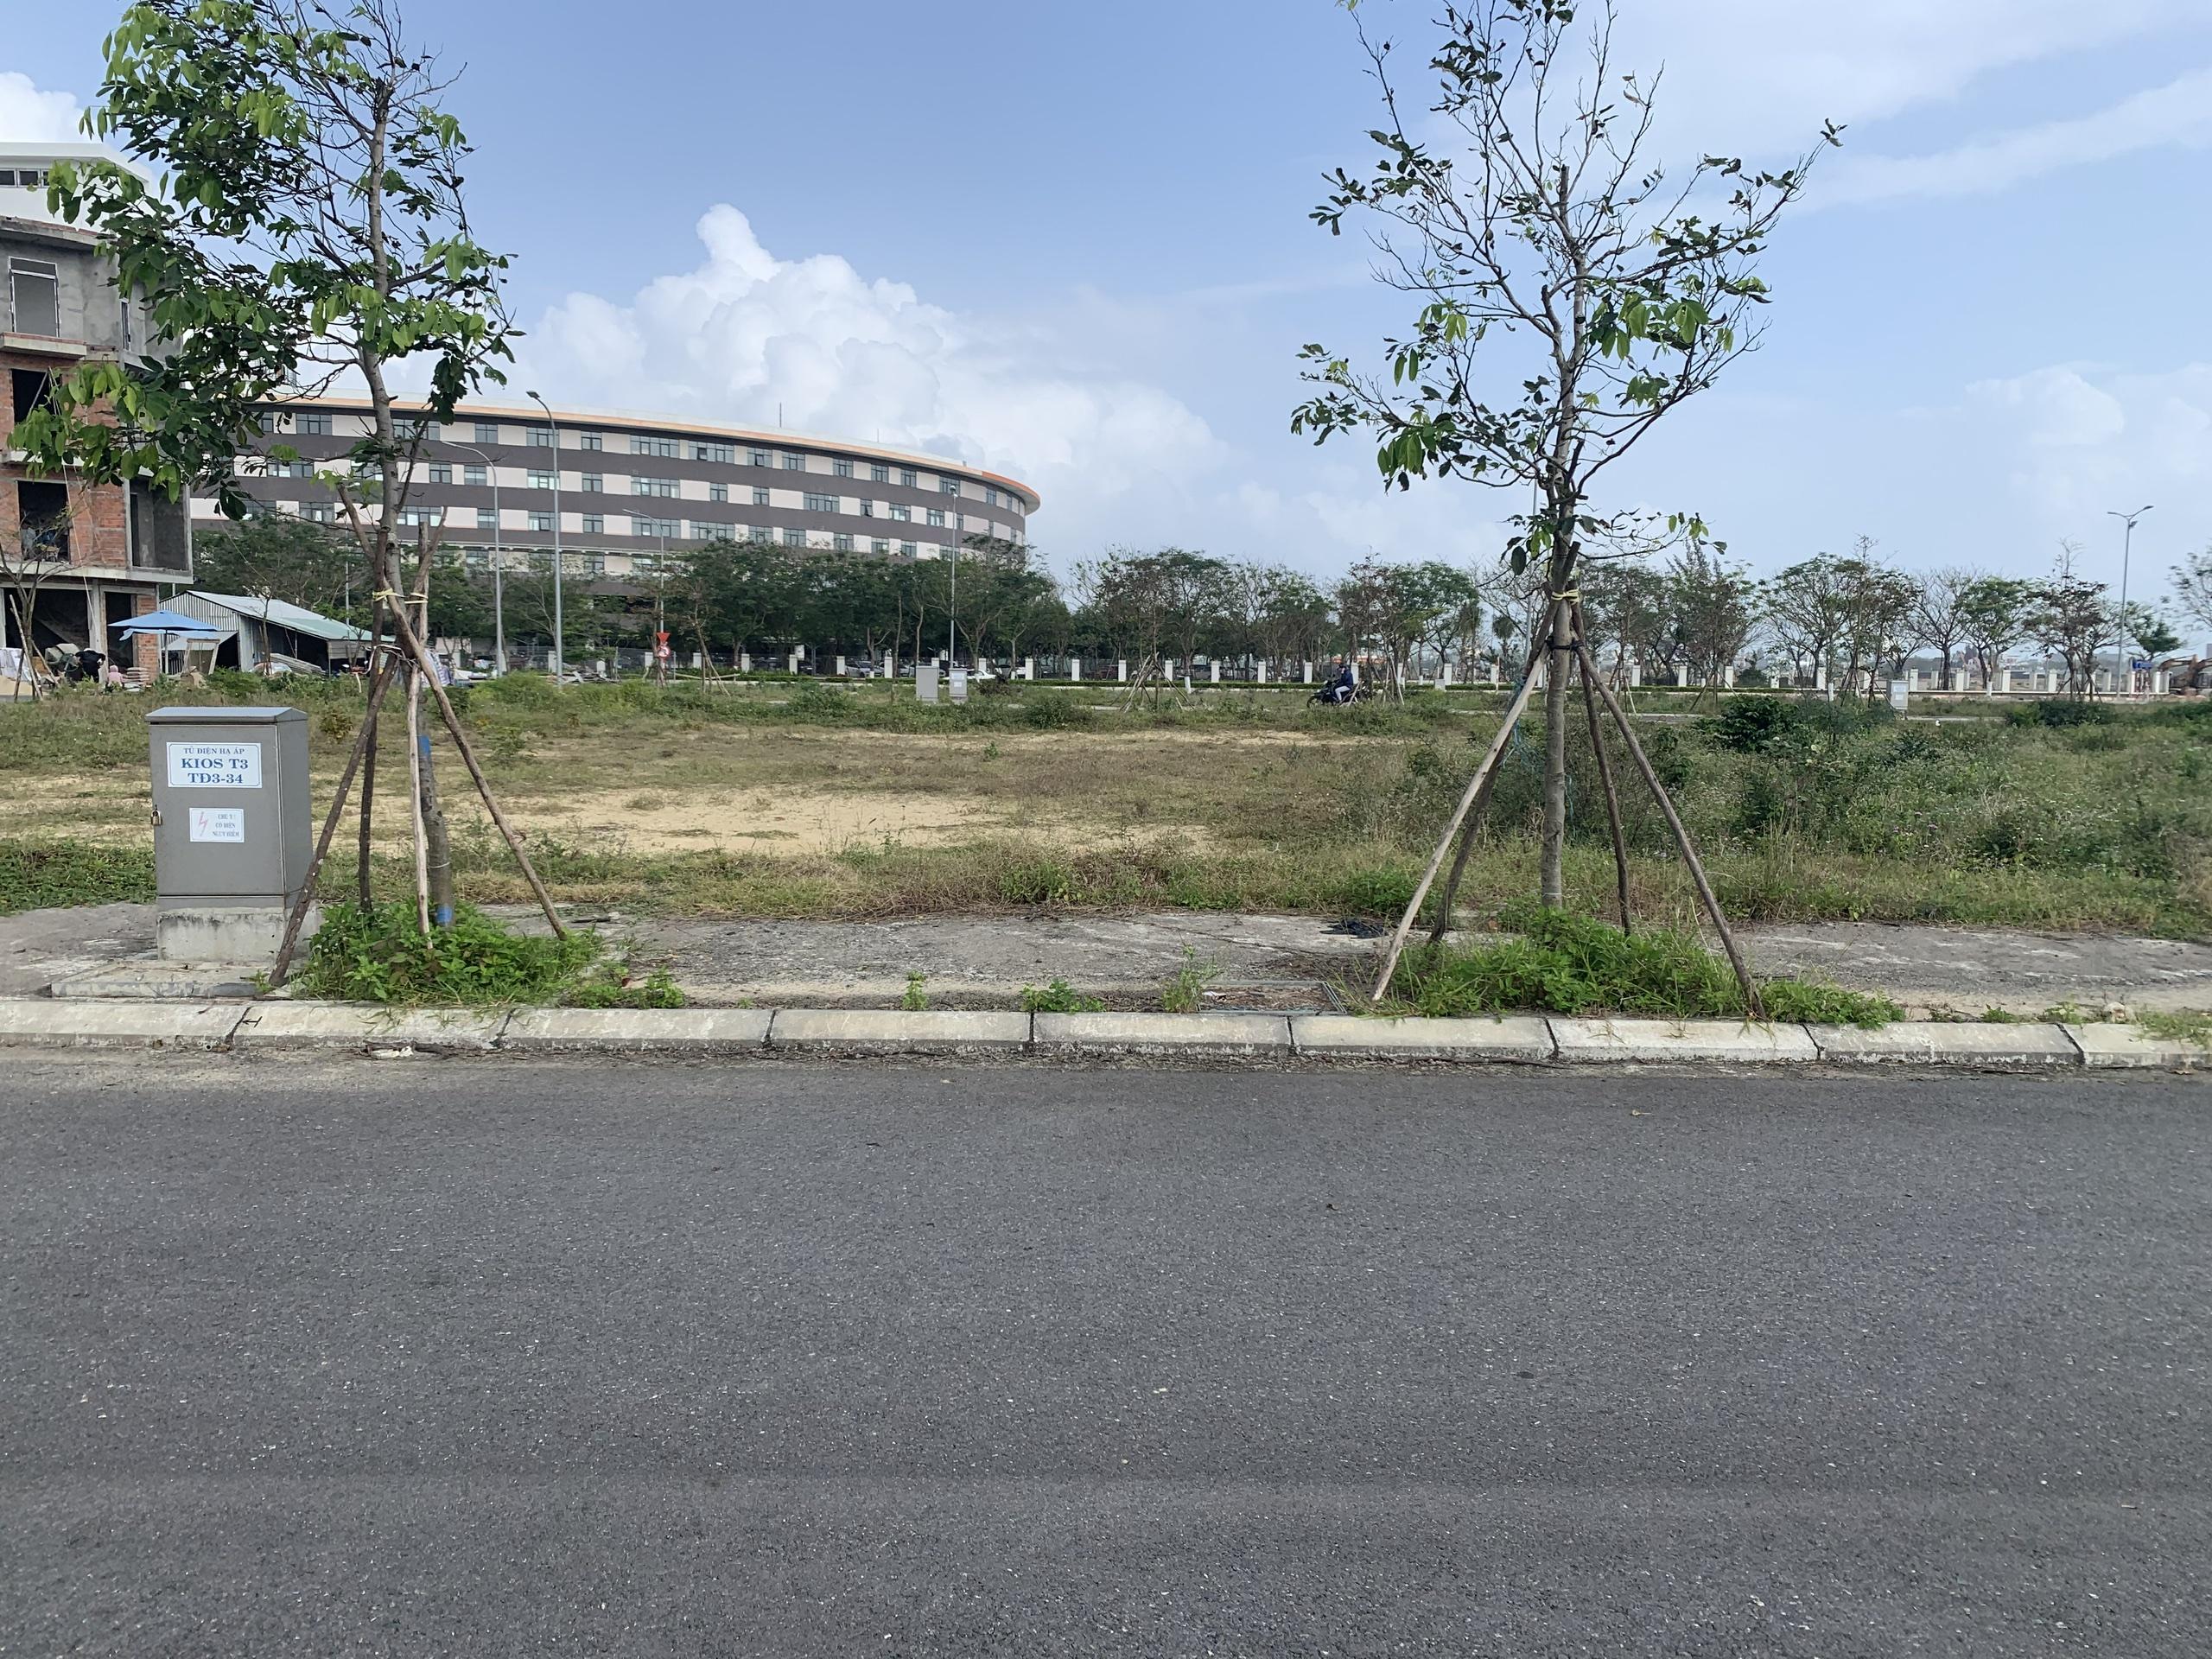 90m2-doi-lung-nam-ky-khoi-nghia